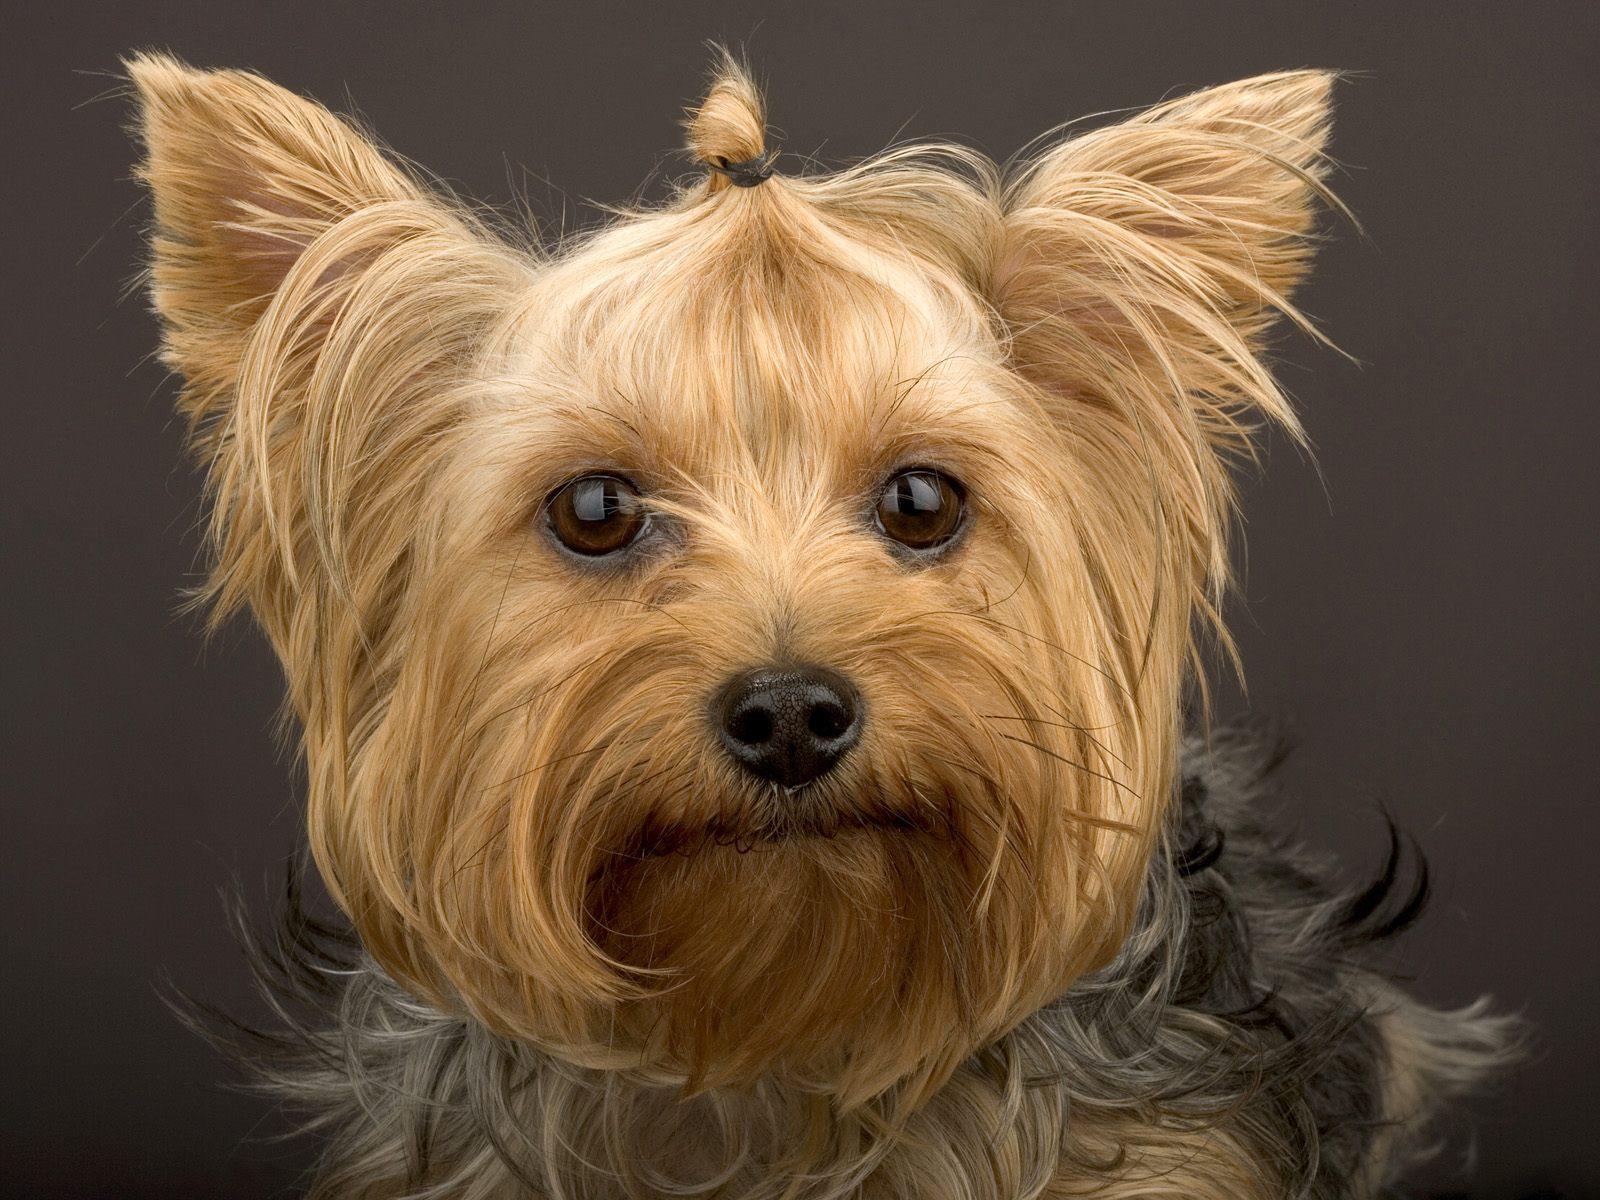 http://3.bp.blogspot.com/-Dcr2bviLx3s/Tp-3sVlkjPI/AAAAAAAAAhE/u5l56A2FOxM/s1600/Cute-Dog-Picture.jpg